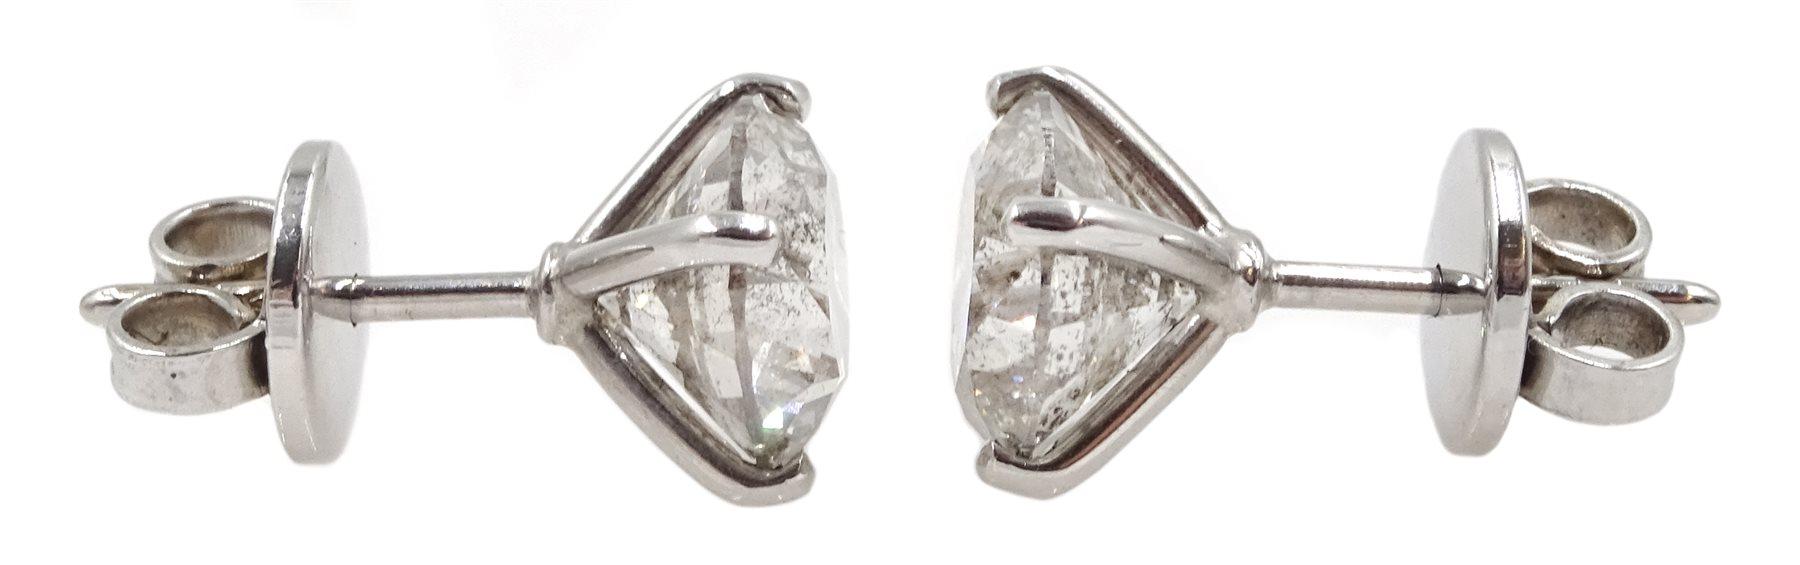 Pair of 18ct white gold diamond stud earrings, stamped 750, diamond total weight 3.52 carat, free UK - Image 3 of 4